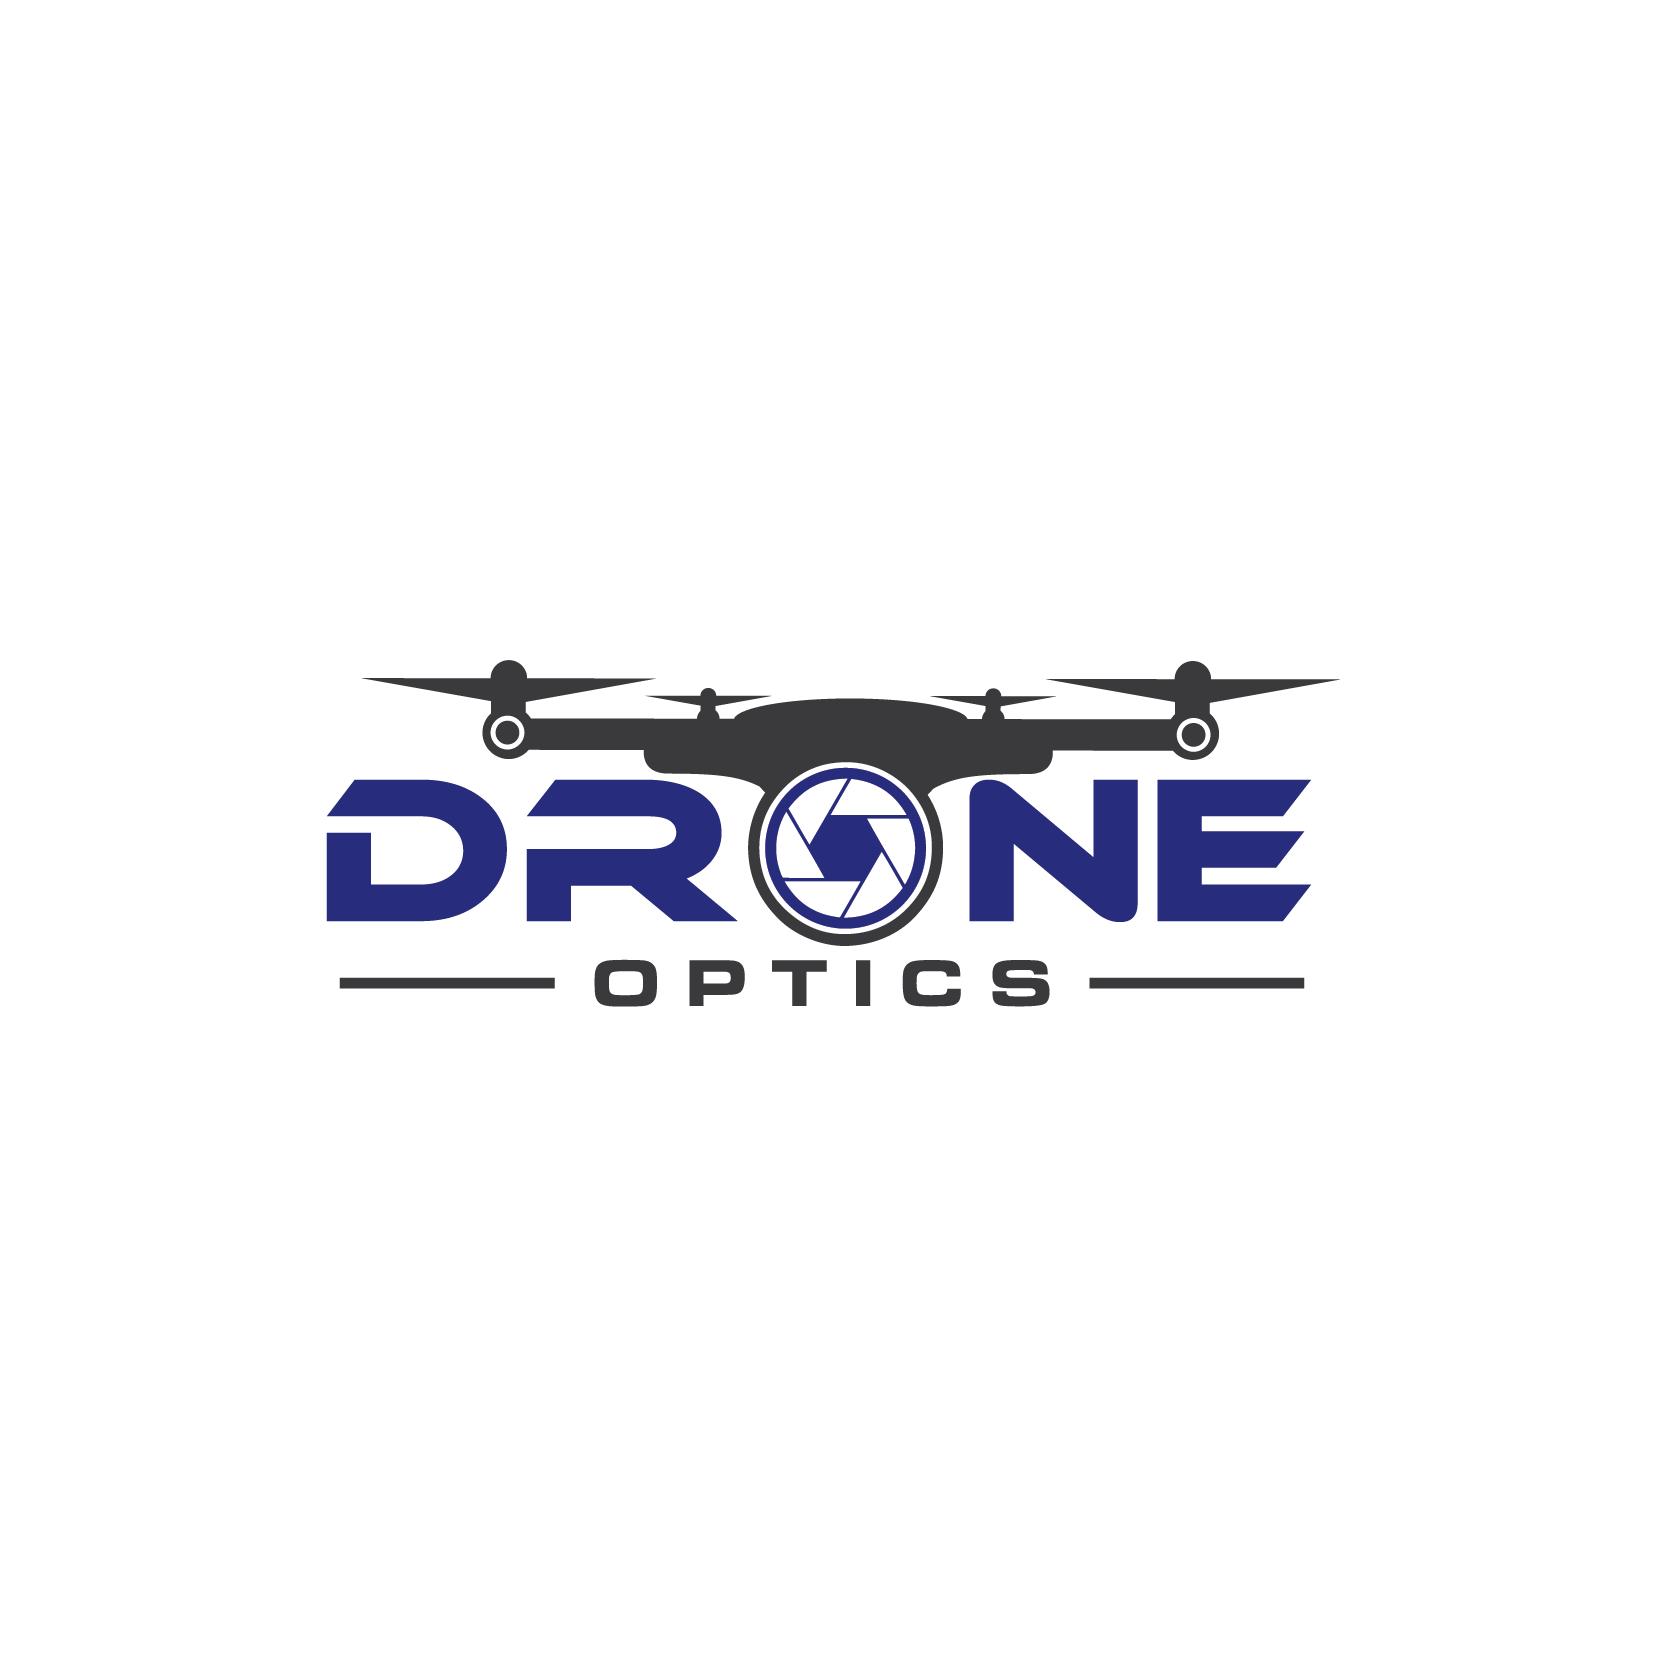 Design a logo for drones!